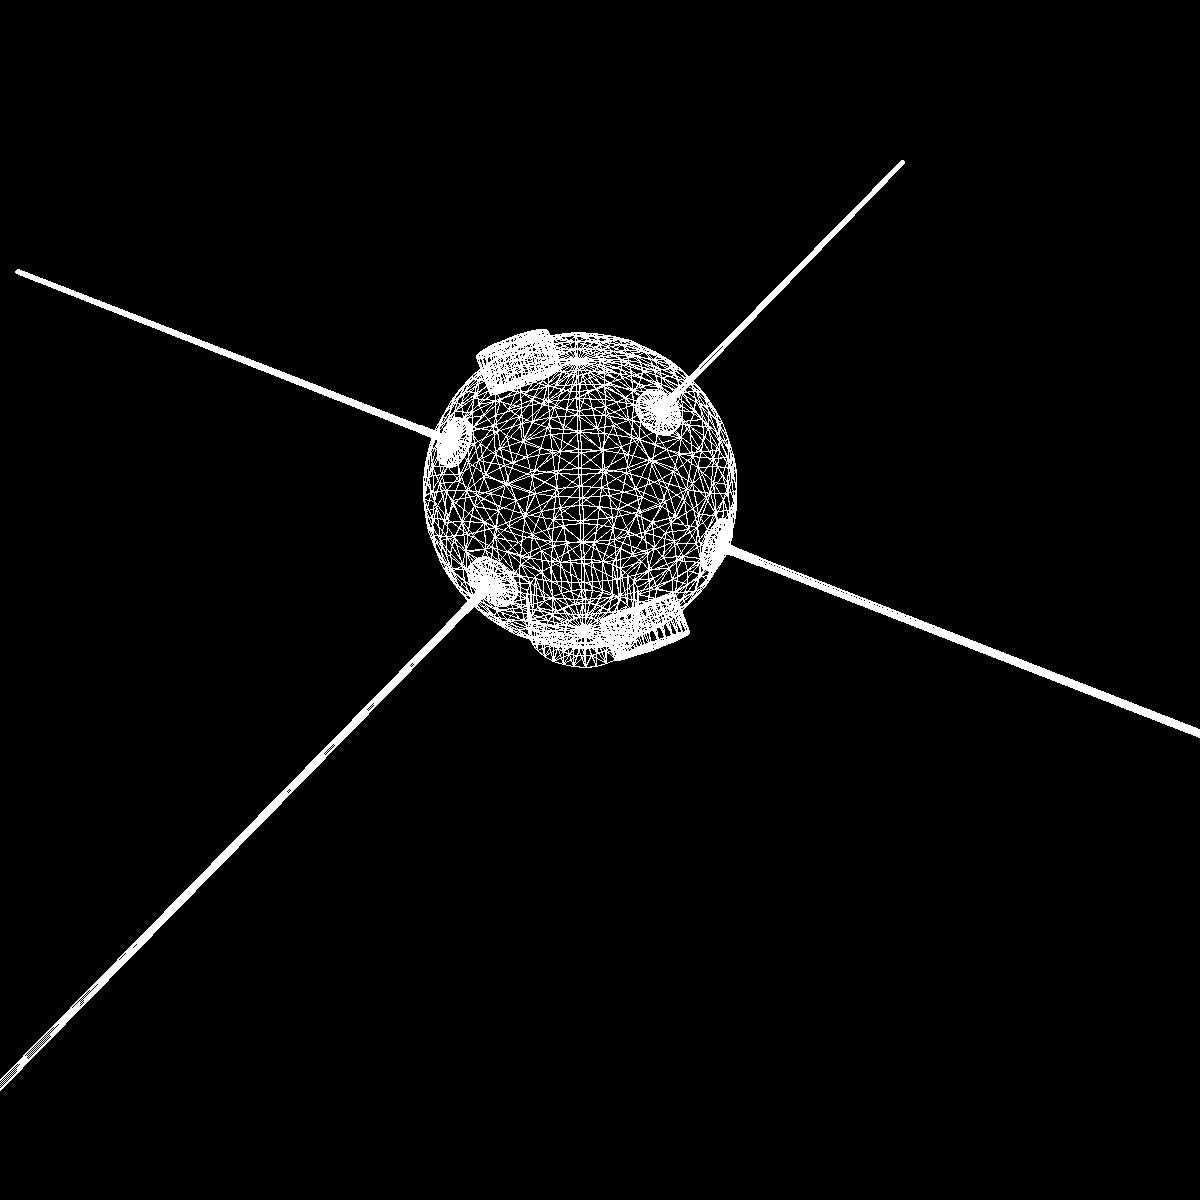 avangard ii satelit 3d model 3ds dxf fbx mješavina cob dae x obj 163948